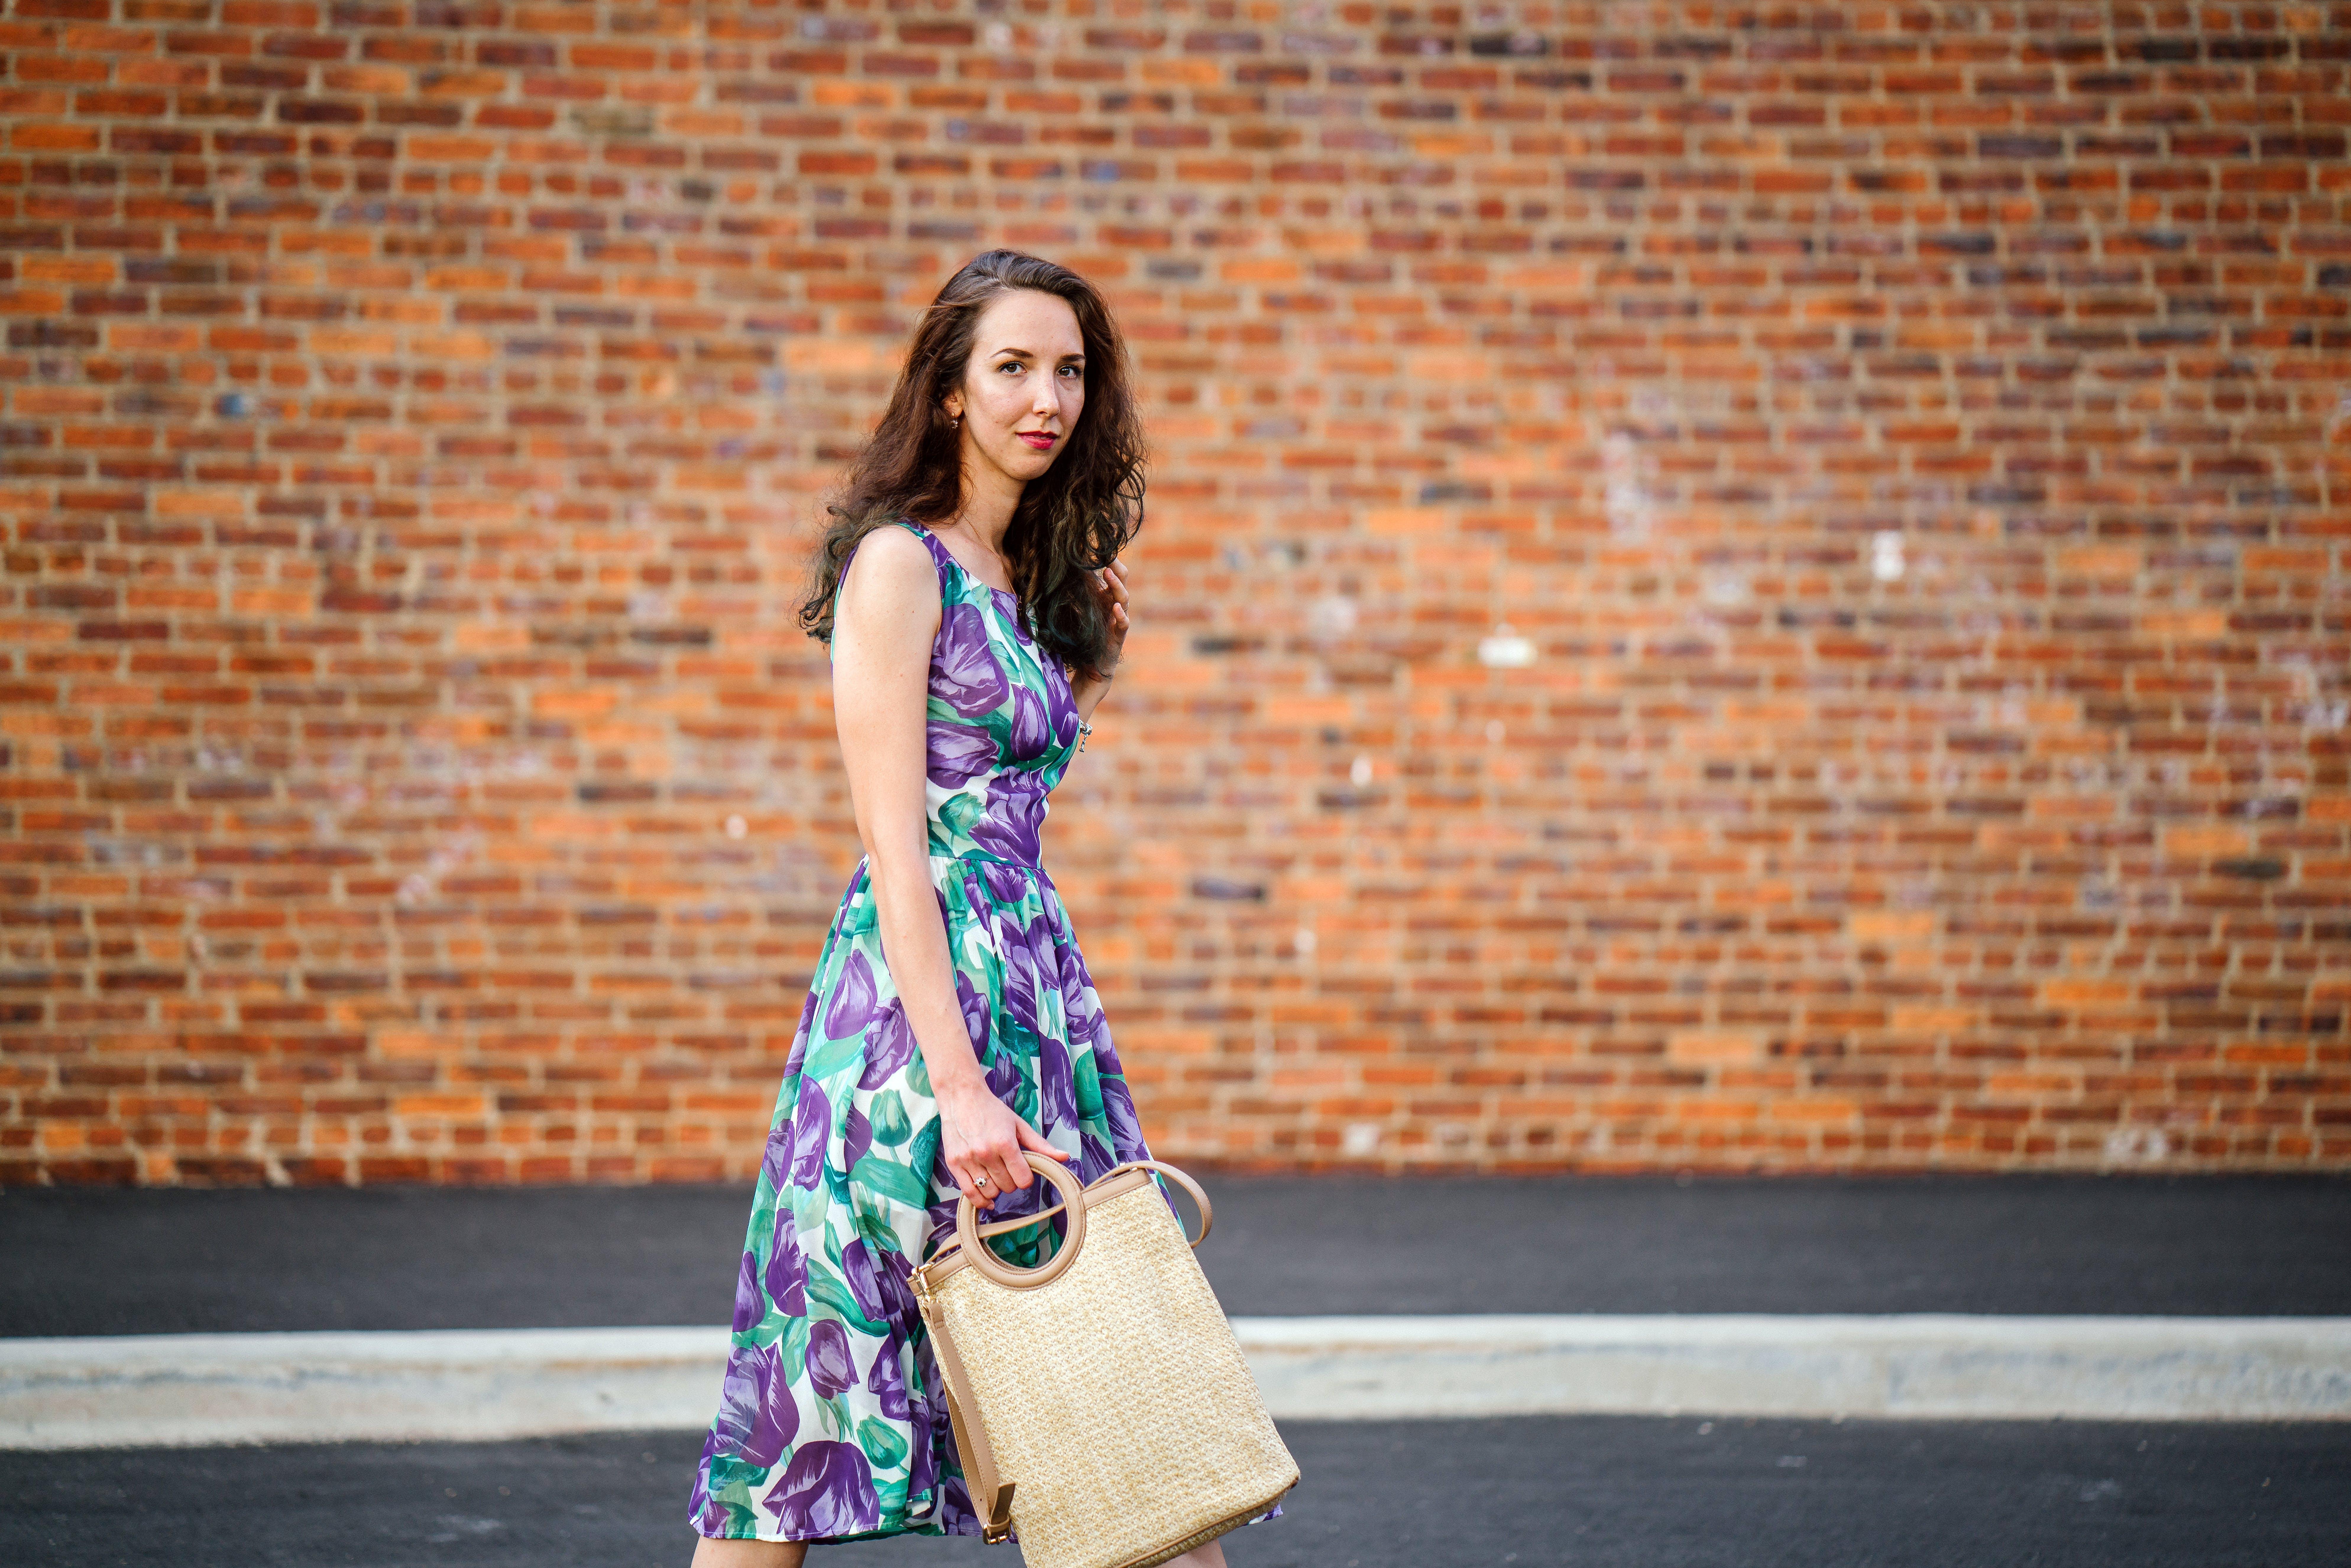 Woman in Purple Floral Dress With Beige Handbag